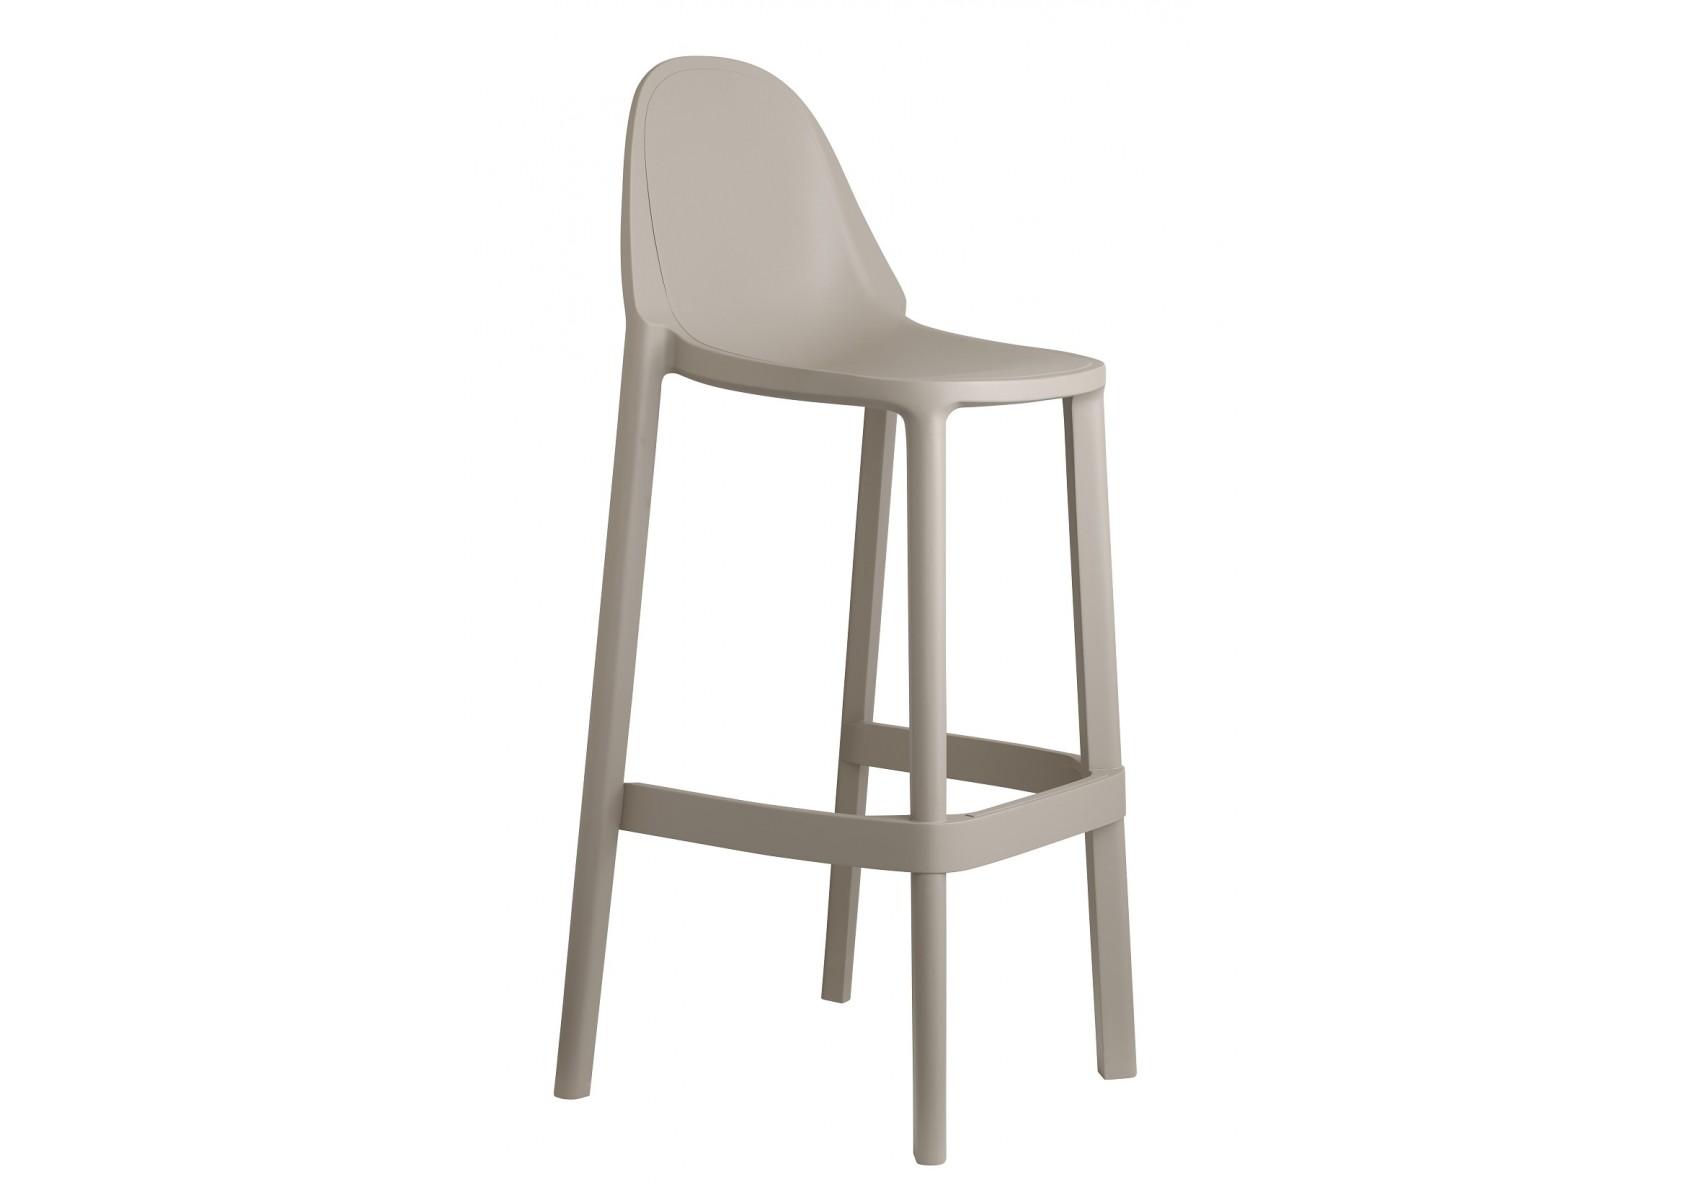 tabouret de bar piu 75 cm scab design. Black Bedroom Furniture Sets. Home Design Ideas